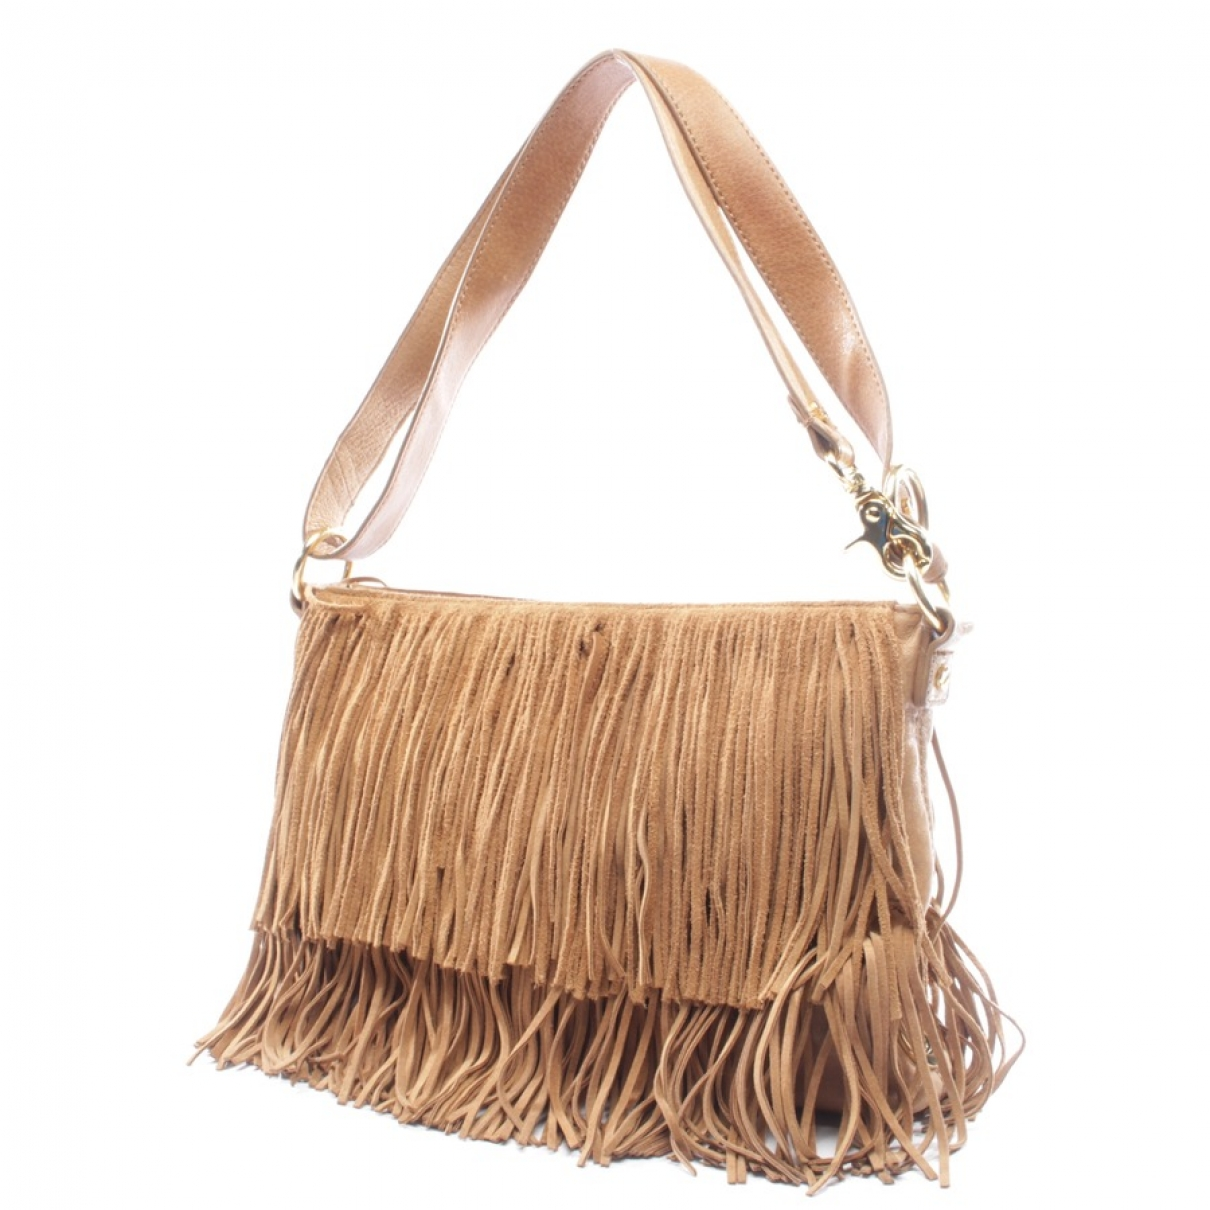 Tory Burch \N Beige Leather handbag for Women \N